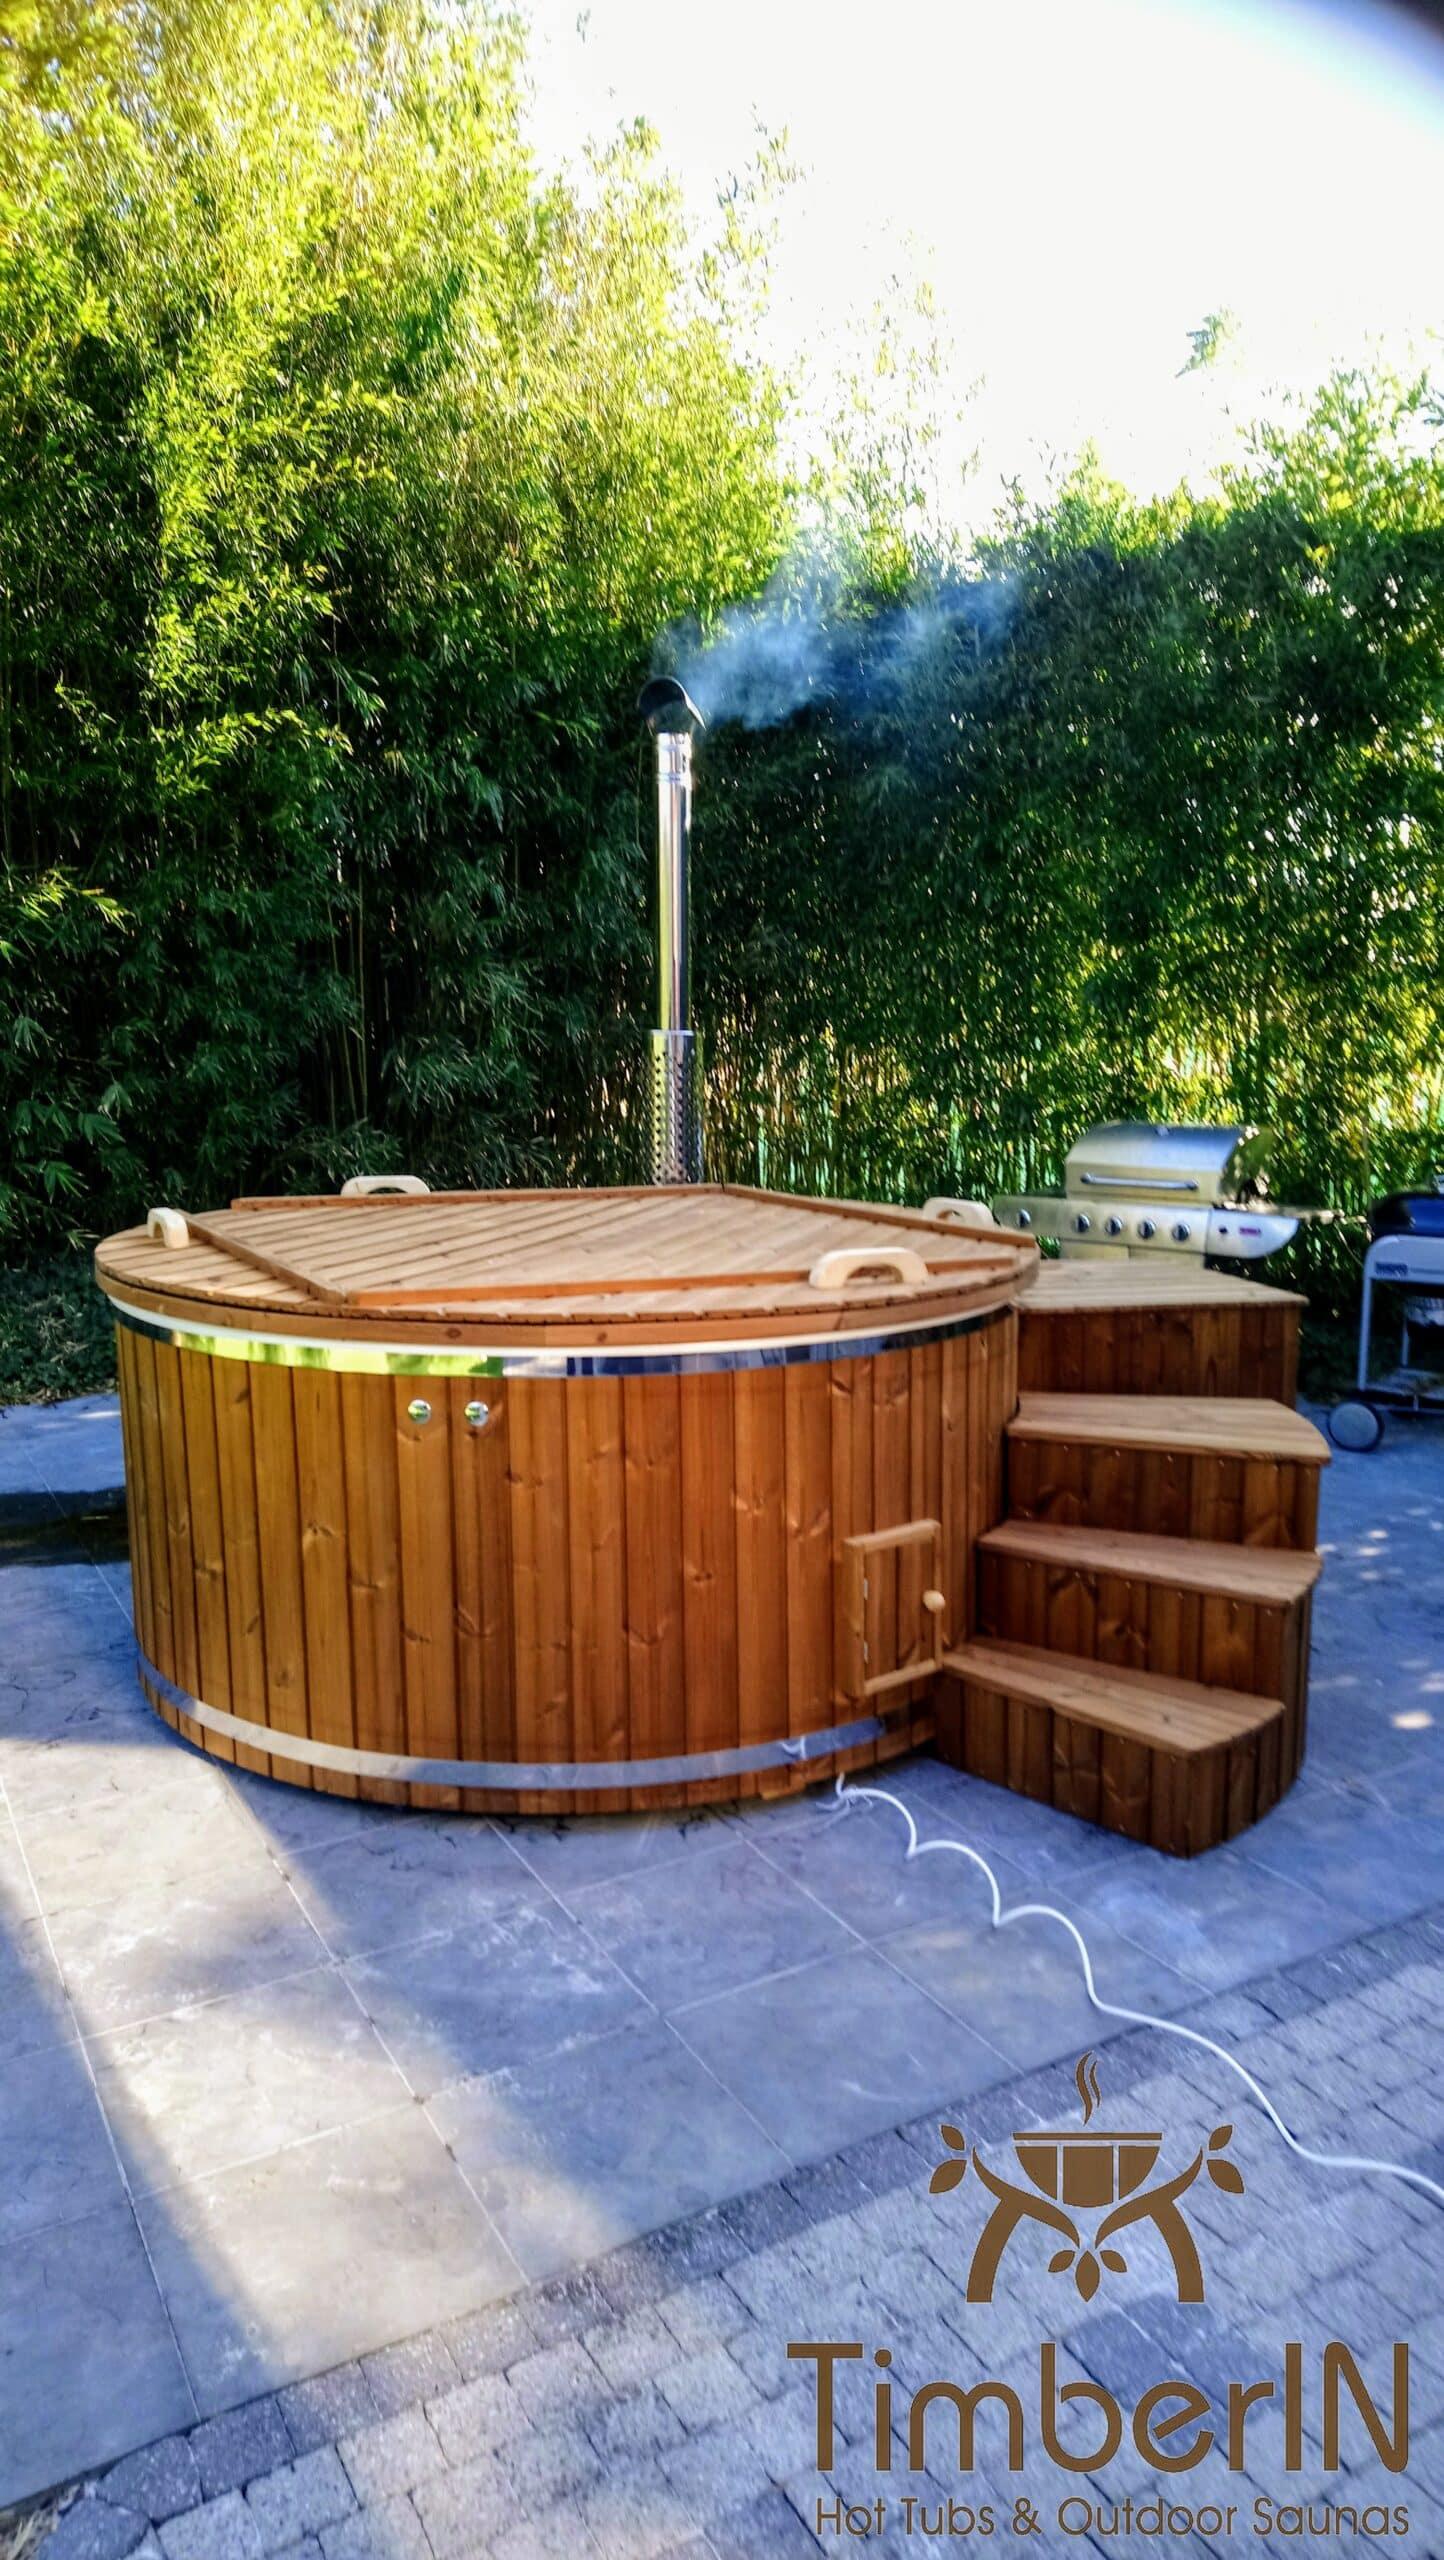 Badetonne Badebottich Hot Tube GFK mit Whirlpoolfunktion 6 scaled